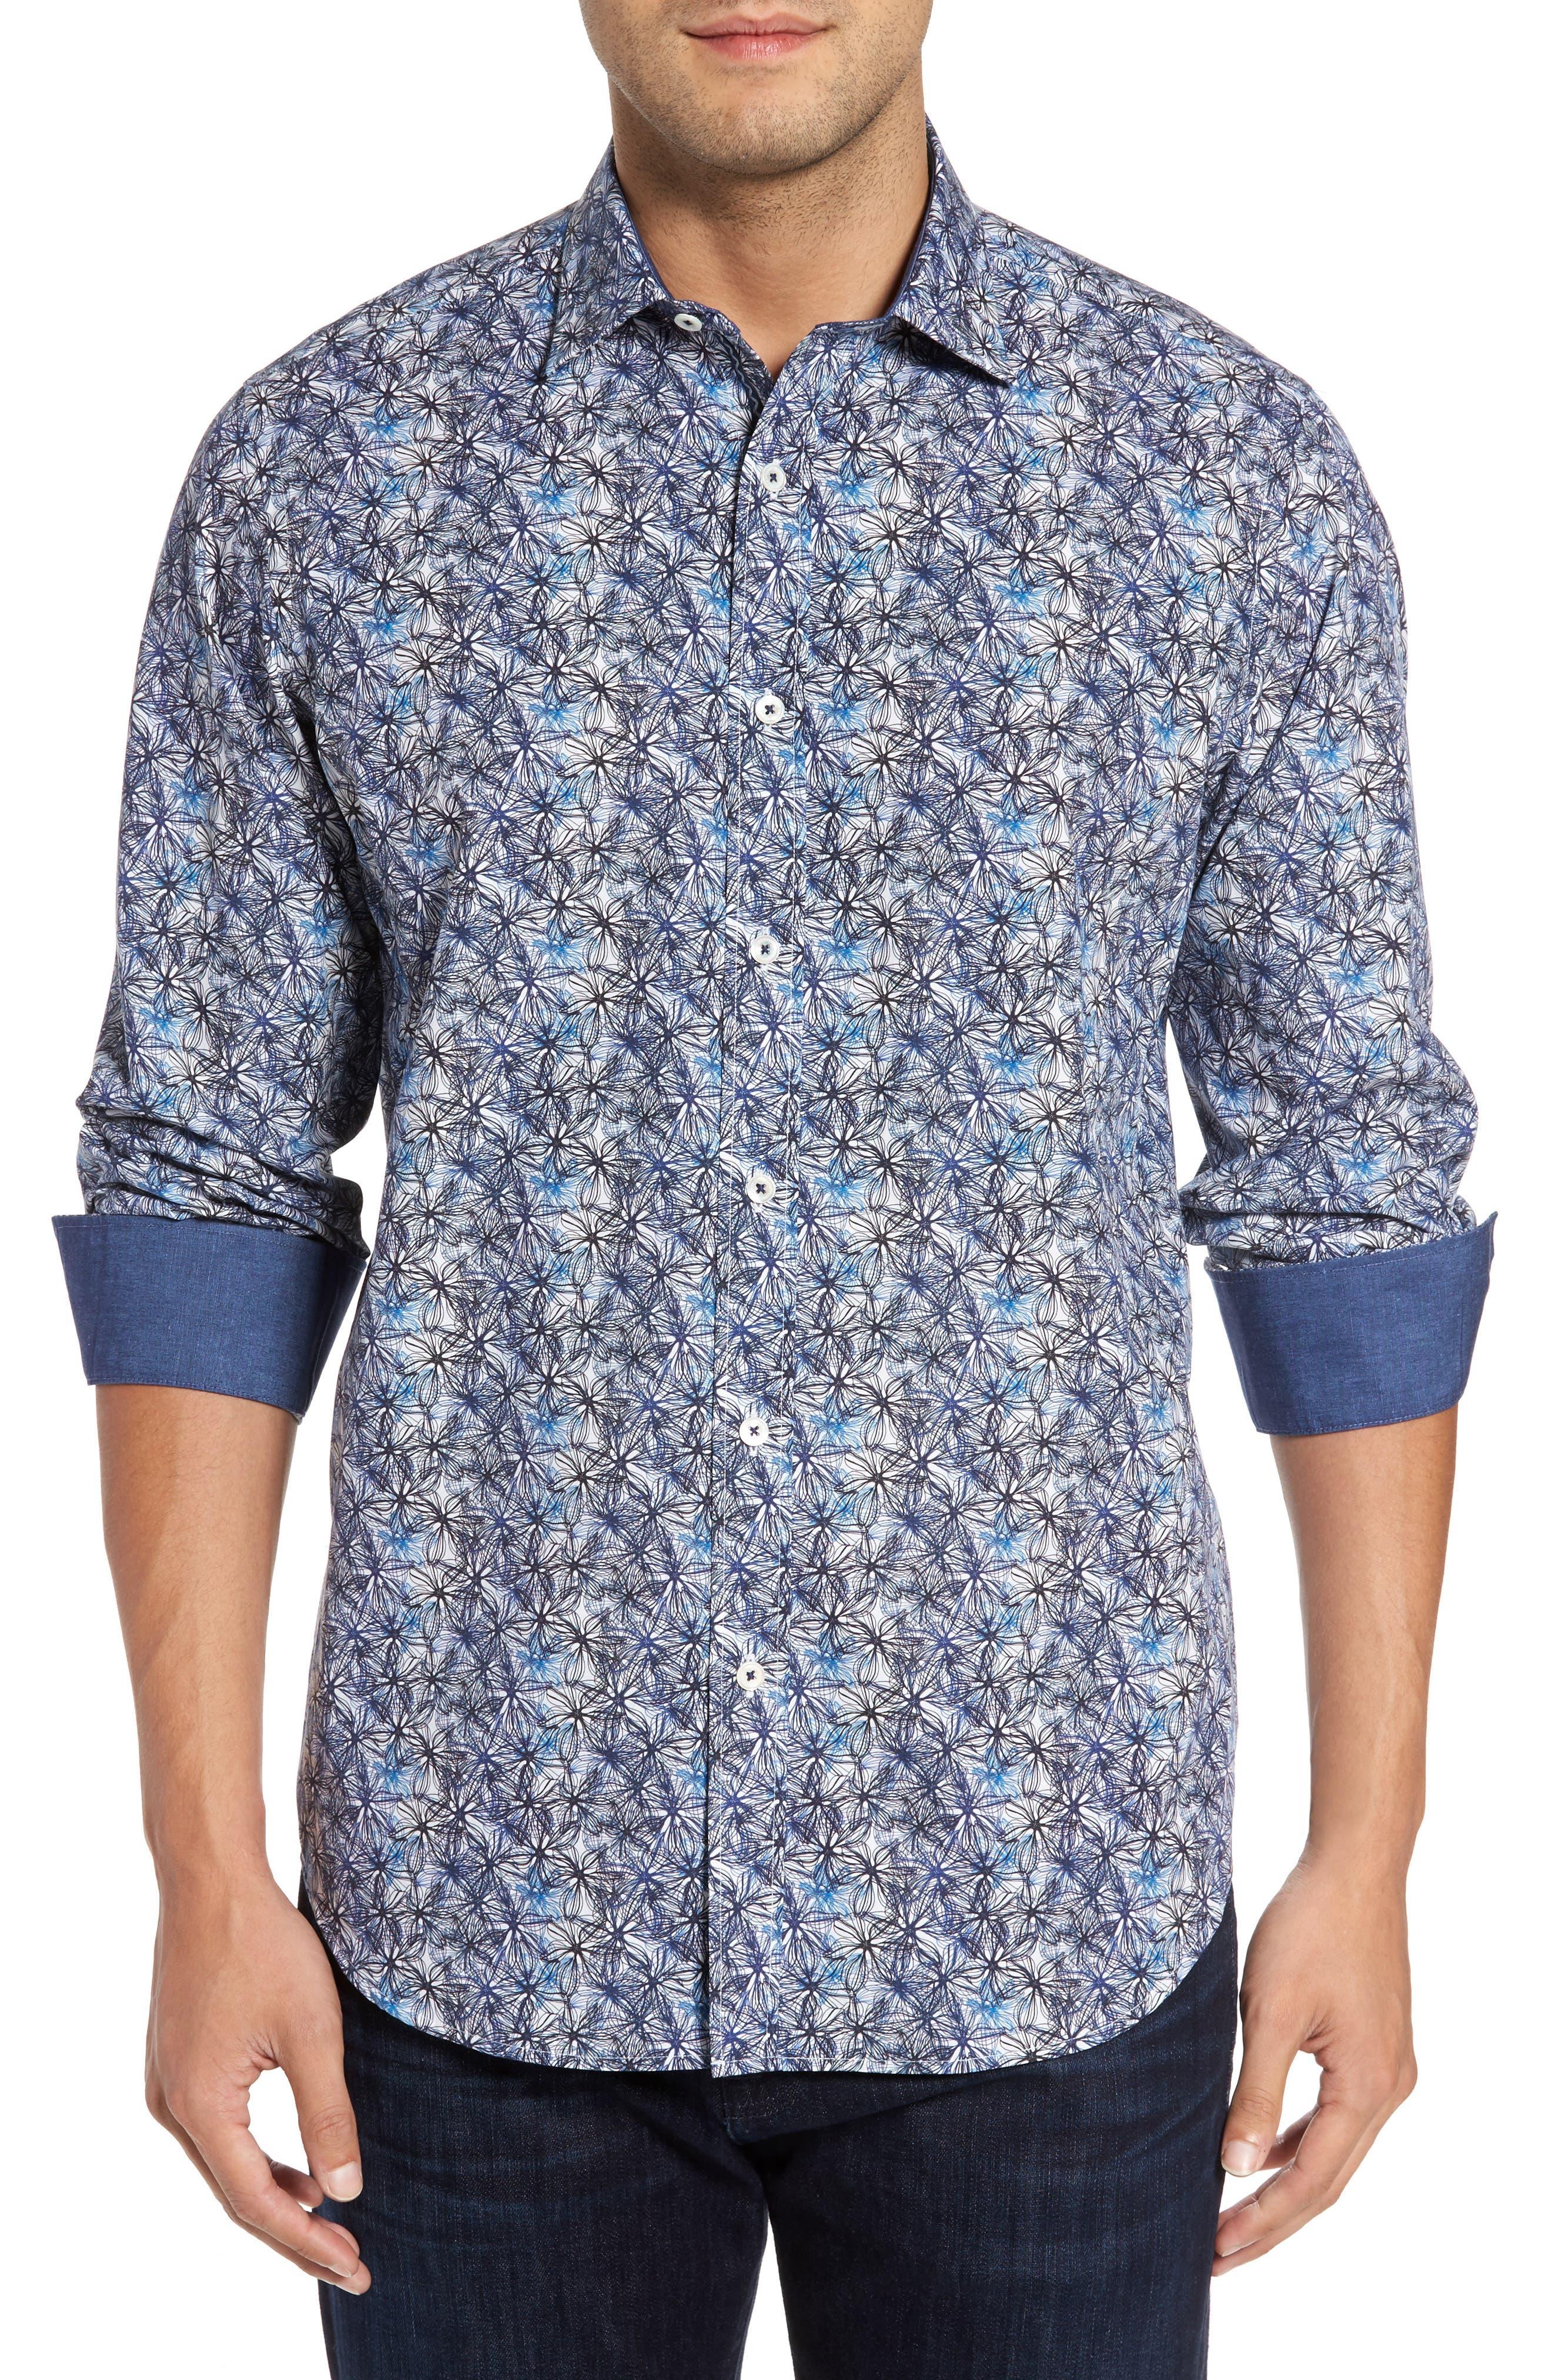 Alternate Image 1 Selected - Bugatchi Trim Fit Print Sport Shirt